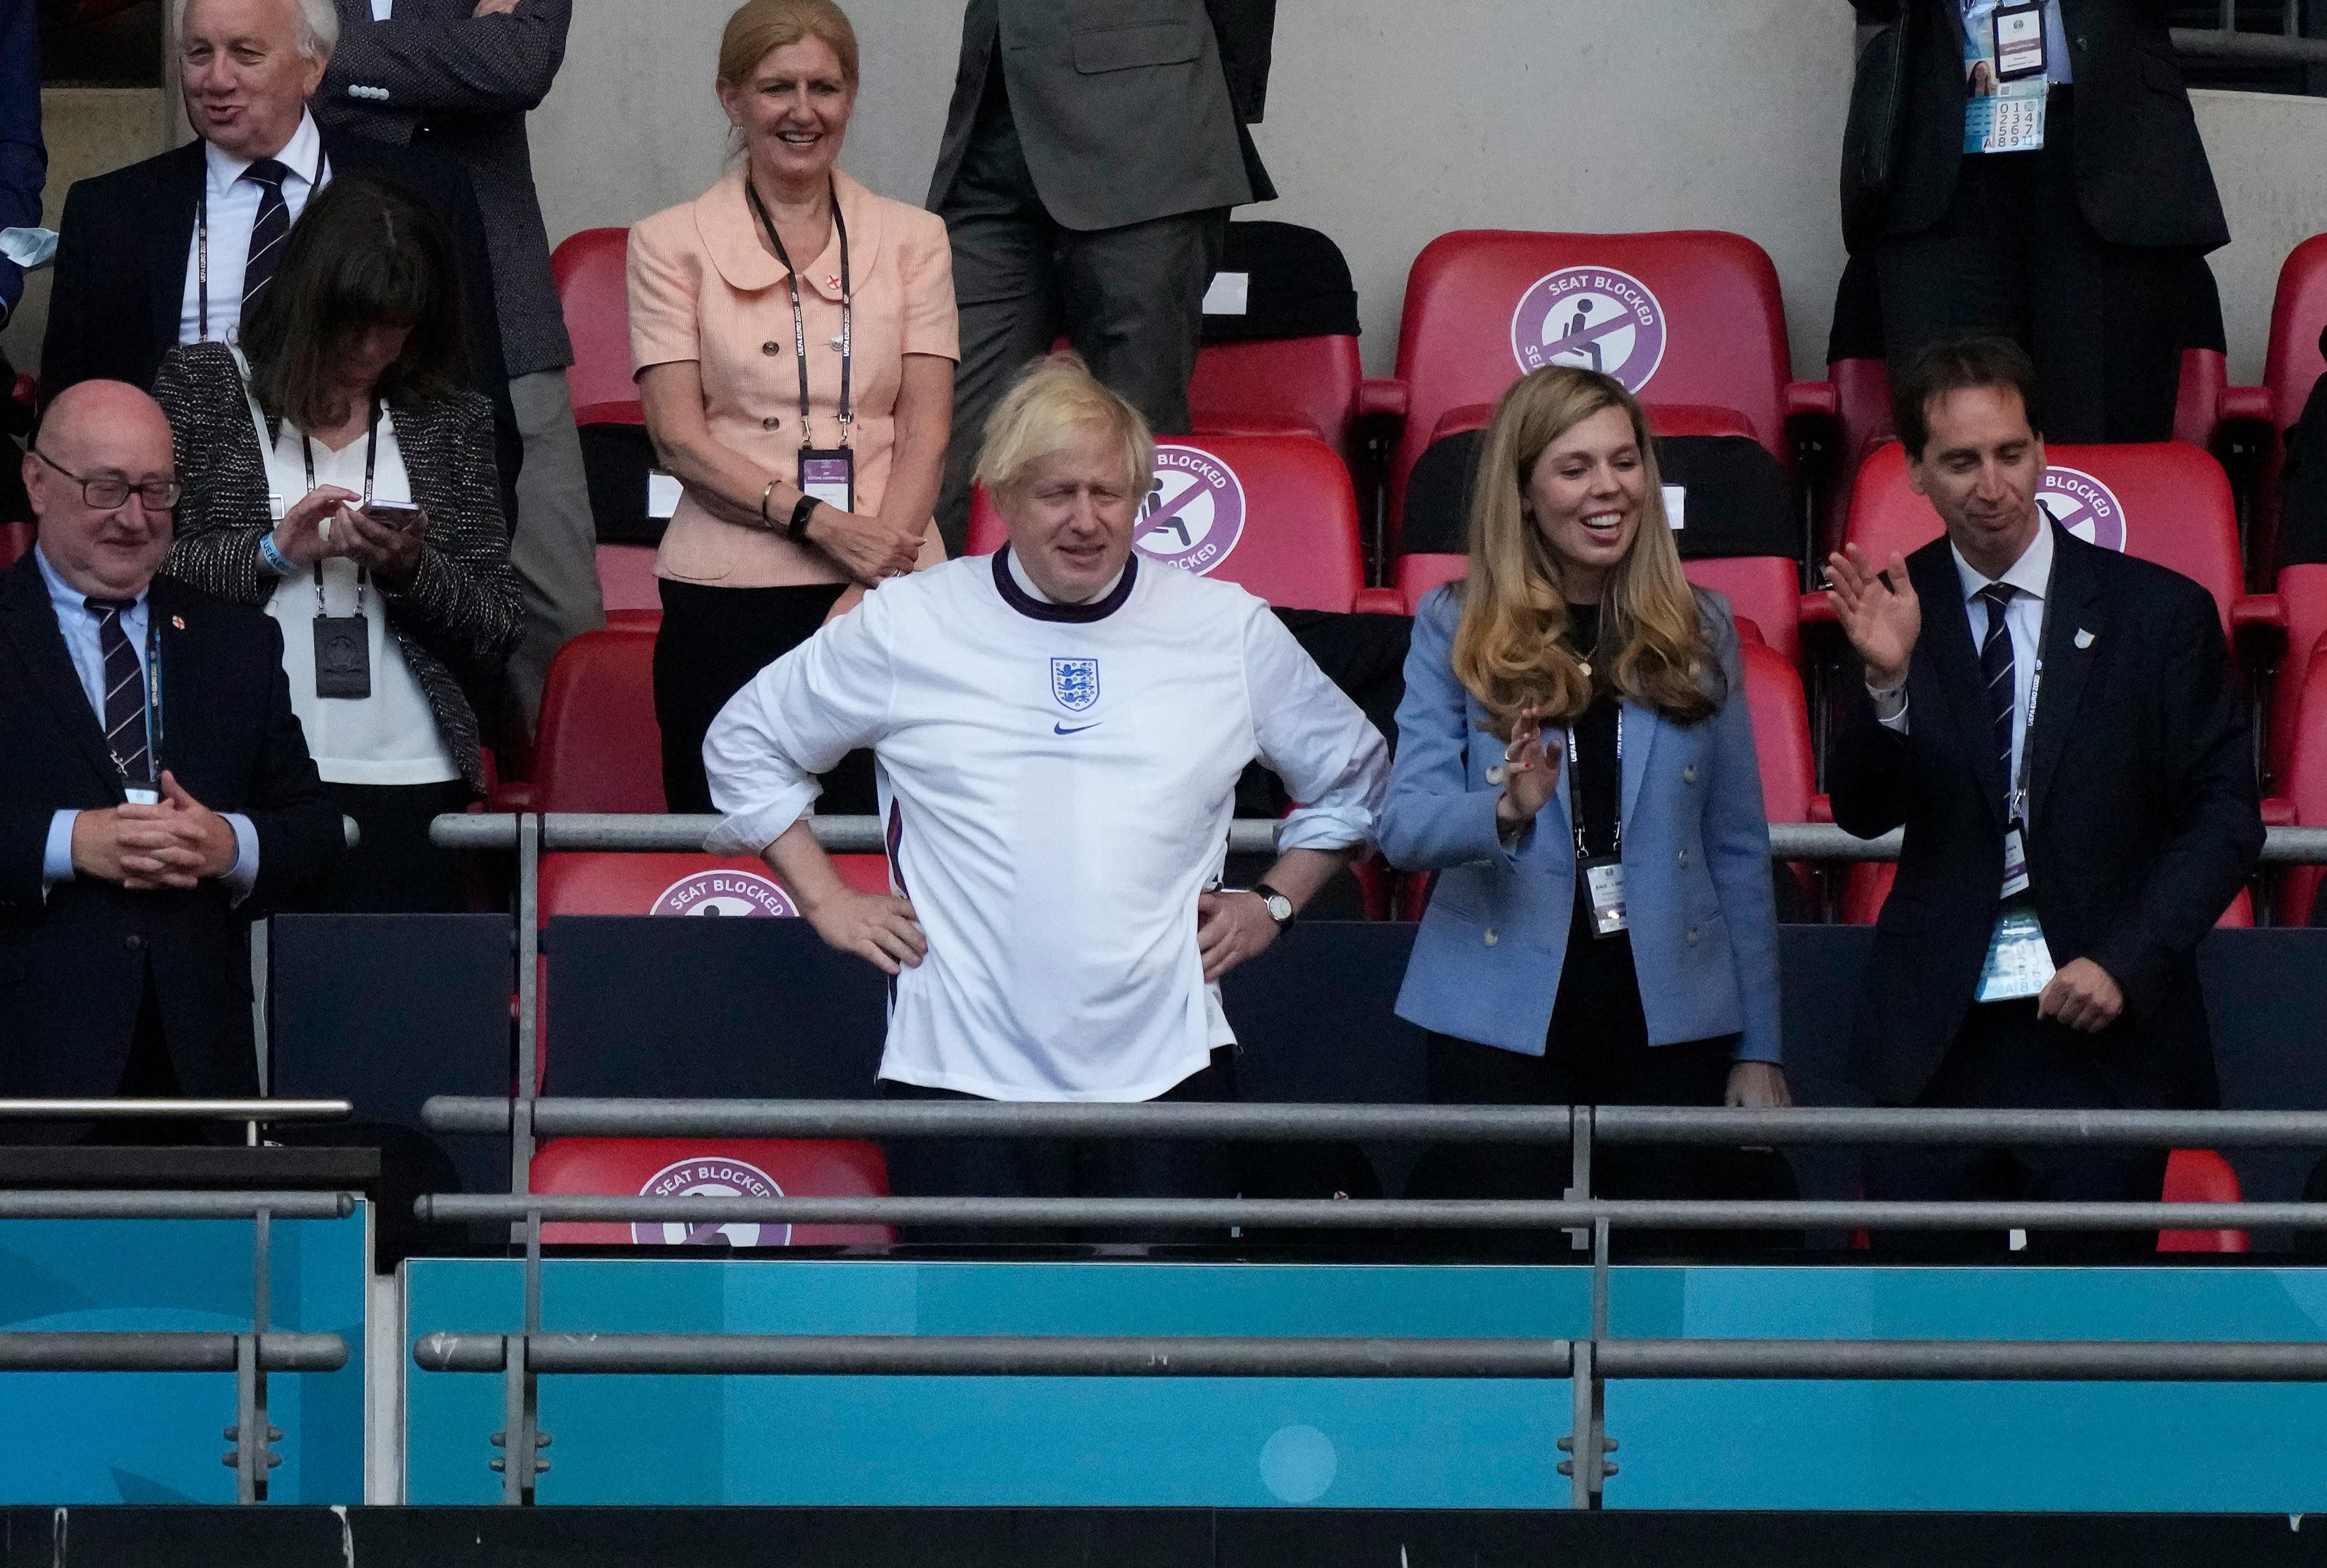 Фото:Премьер Великобритании Борис Джонсон с супругой (Frank Augstein - Pool/Getty Images)